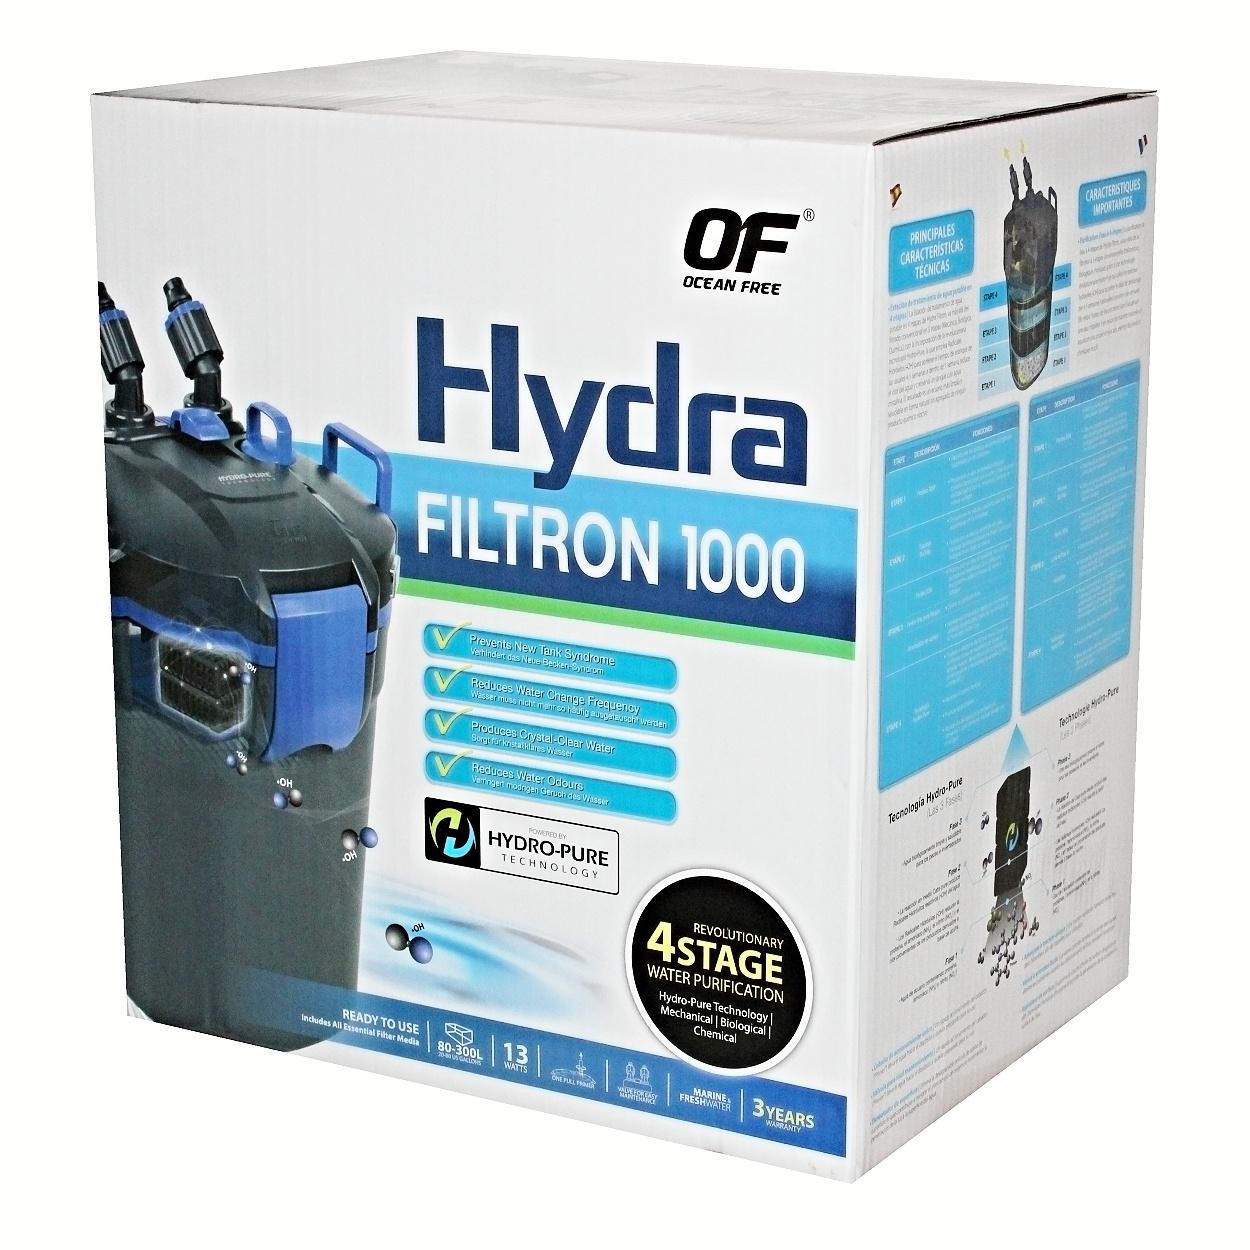 Ocean Free Hydra Filtron 1000